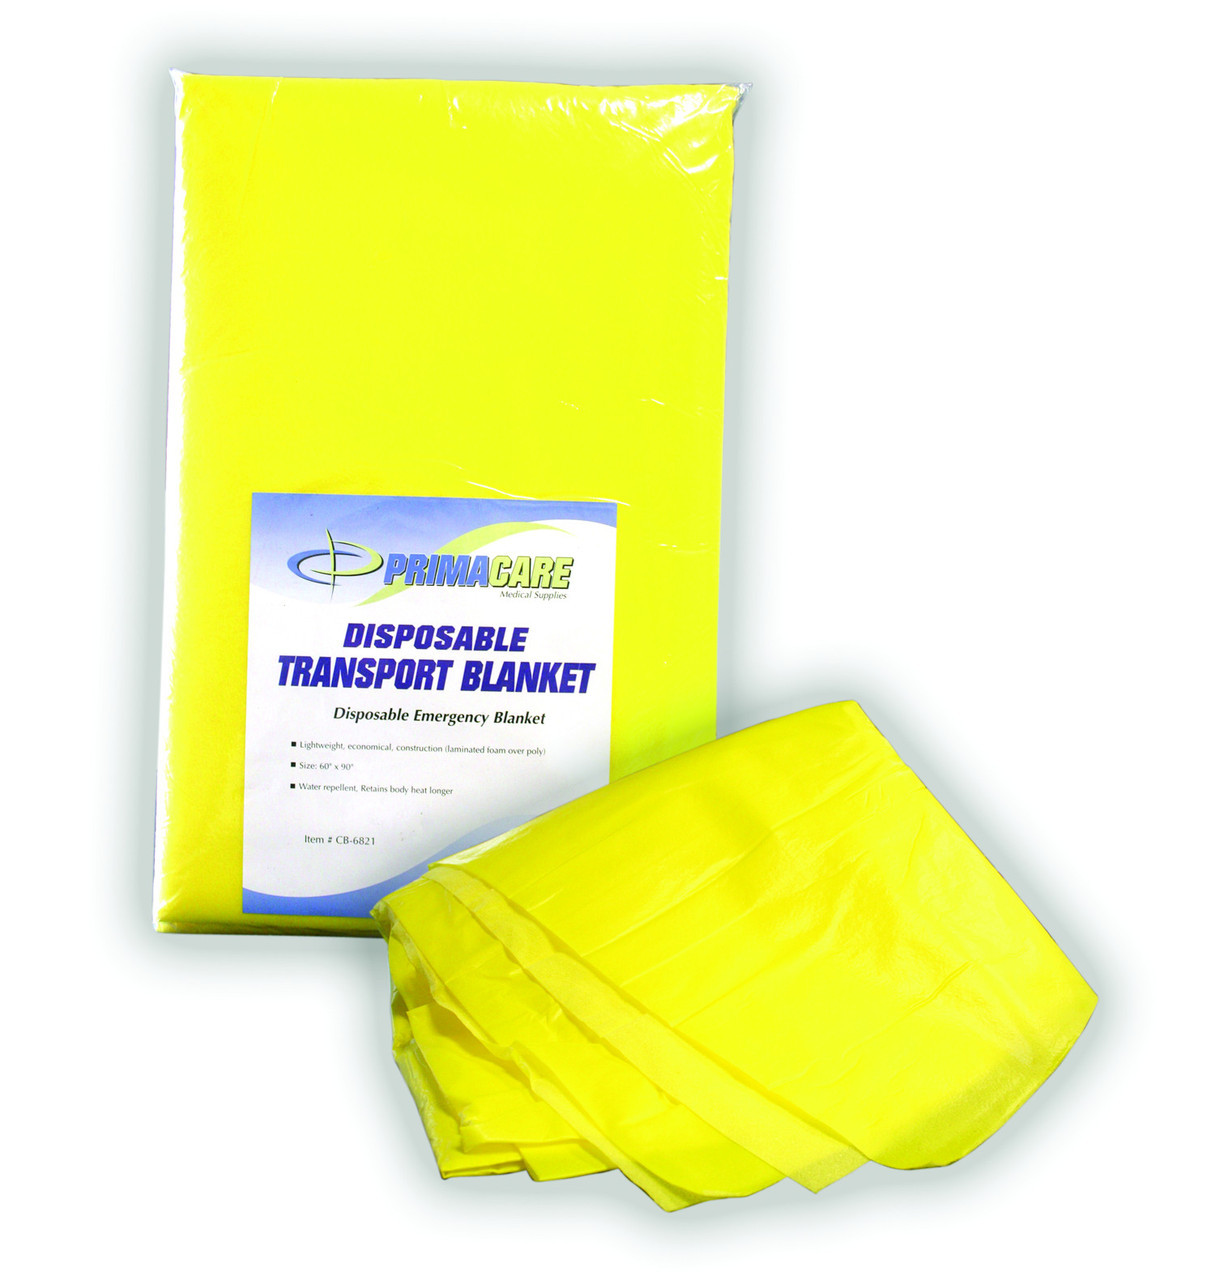 Disposable Emergency Blanket - Yellow